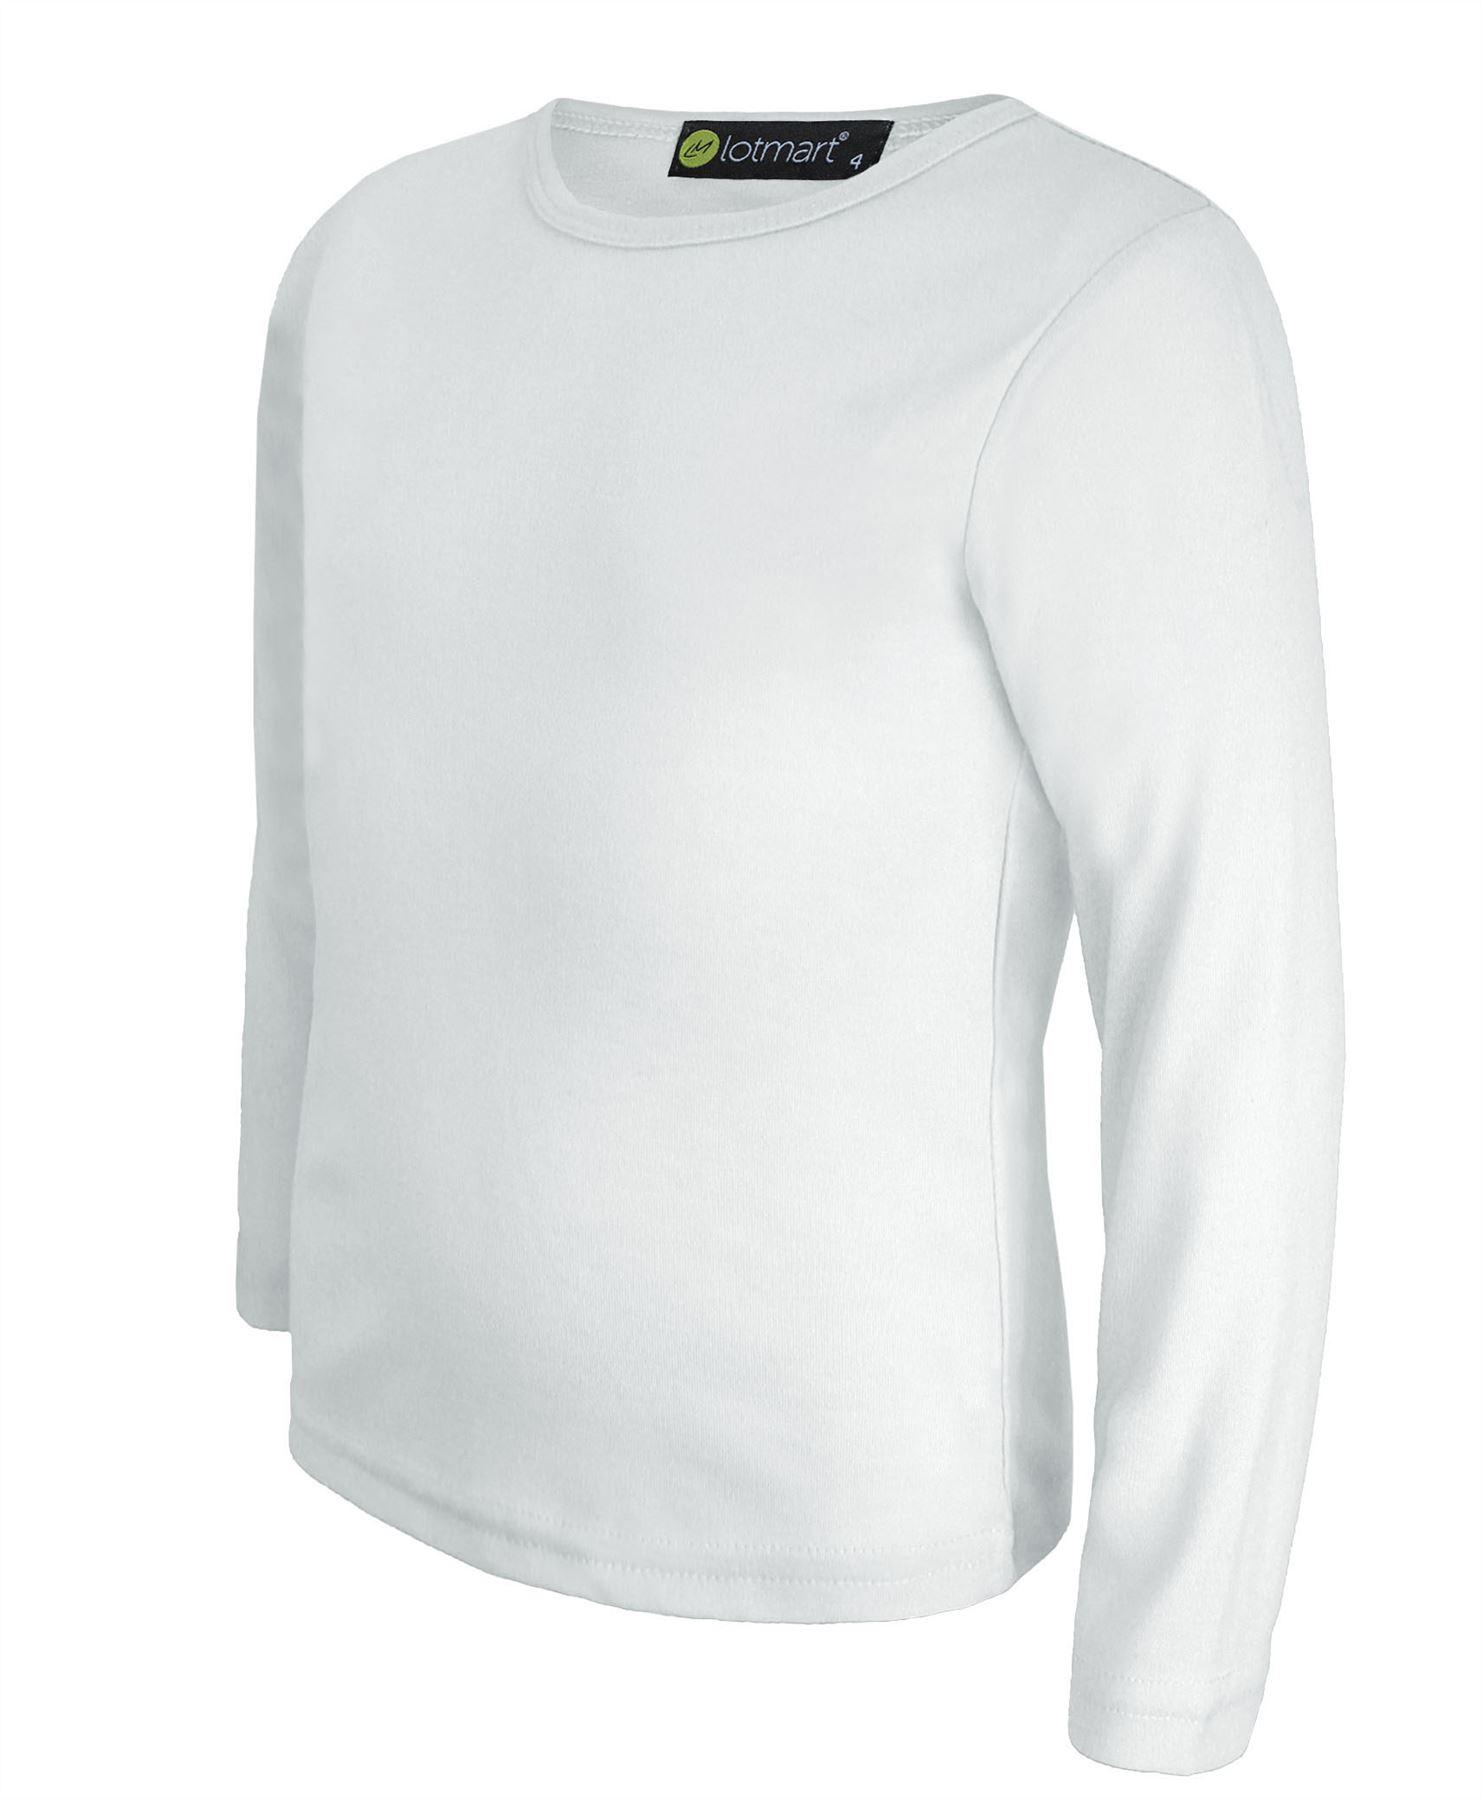 b18d6a83c38dd Toddlers Plain White T Shirts   Azərbaycan Dillər Universiteti